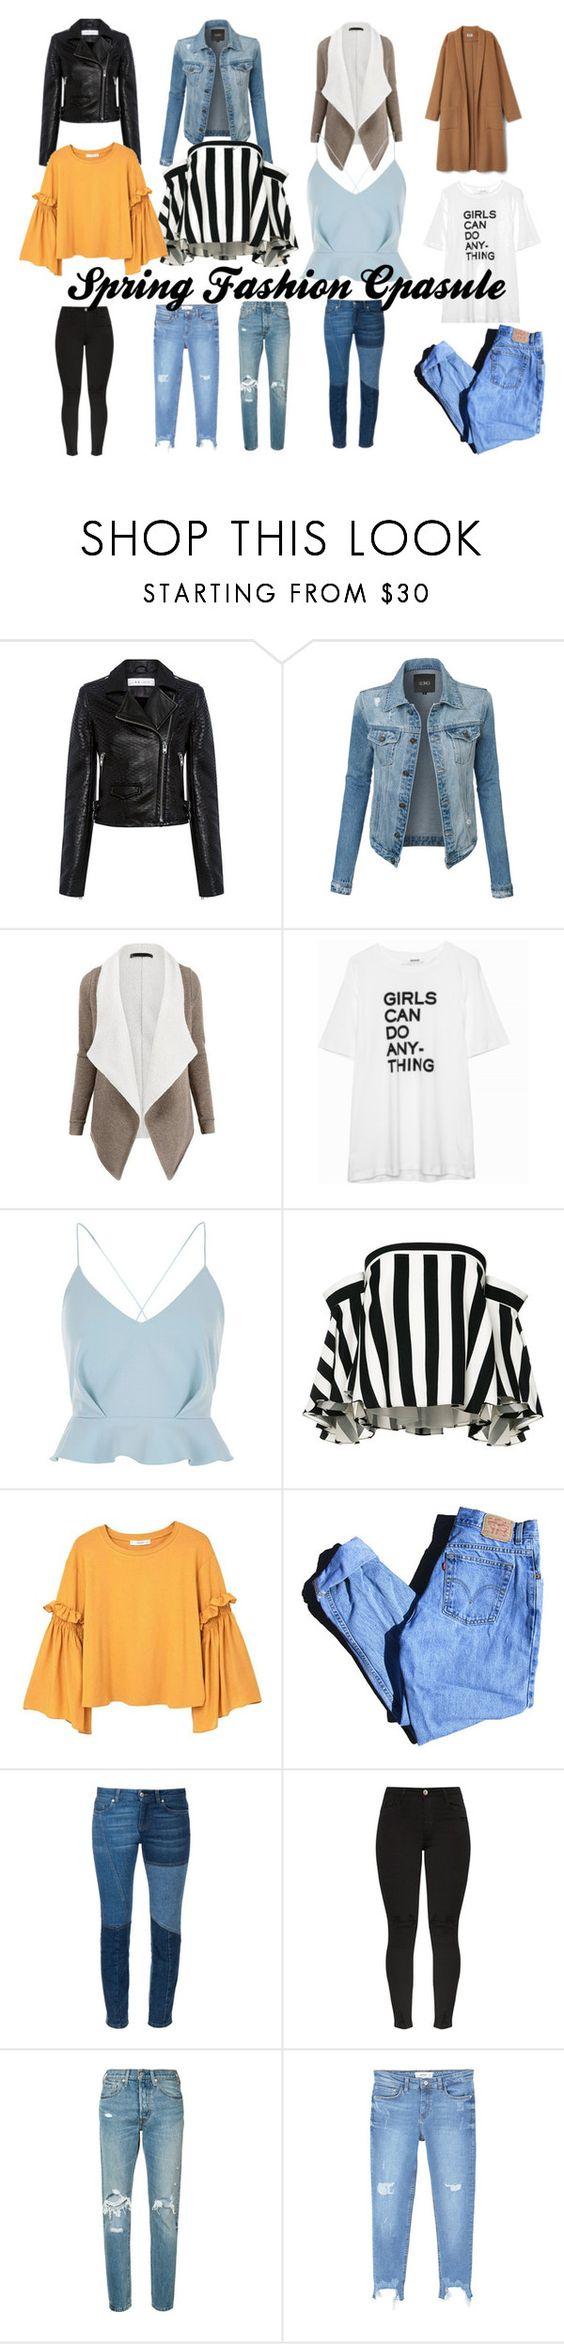 Spring Fashion Cpasule